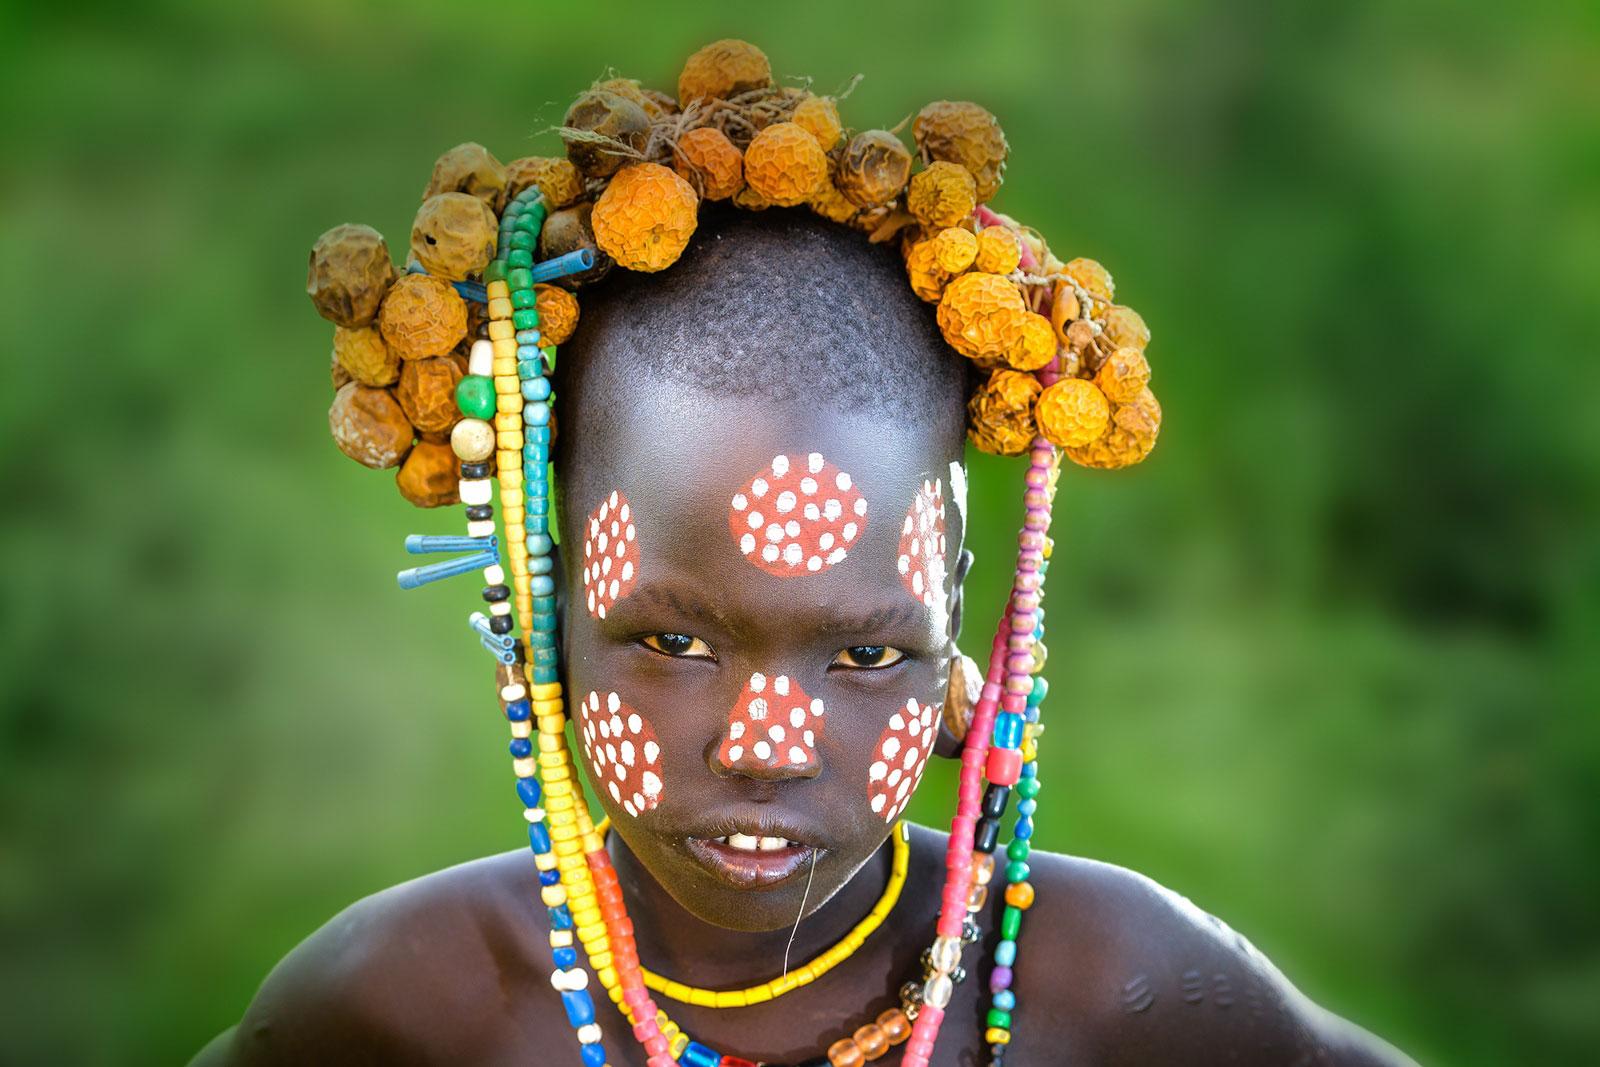 ETH_Cultural-Portraits-Alex-Mursi-Girl-©-Dinkesh-Ethiopia-Tours.jpg